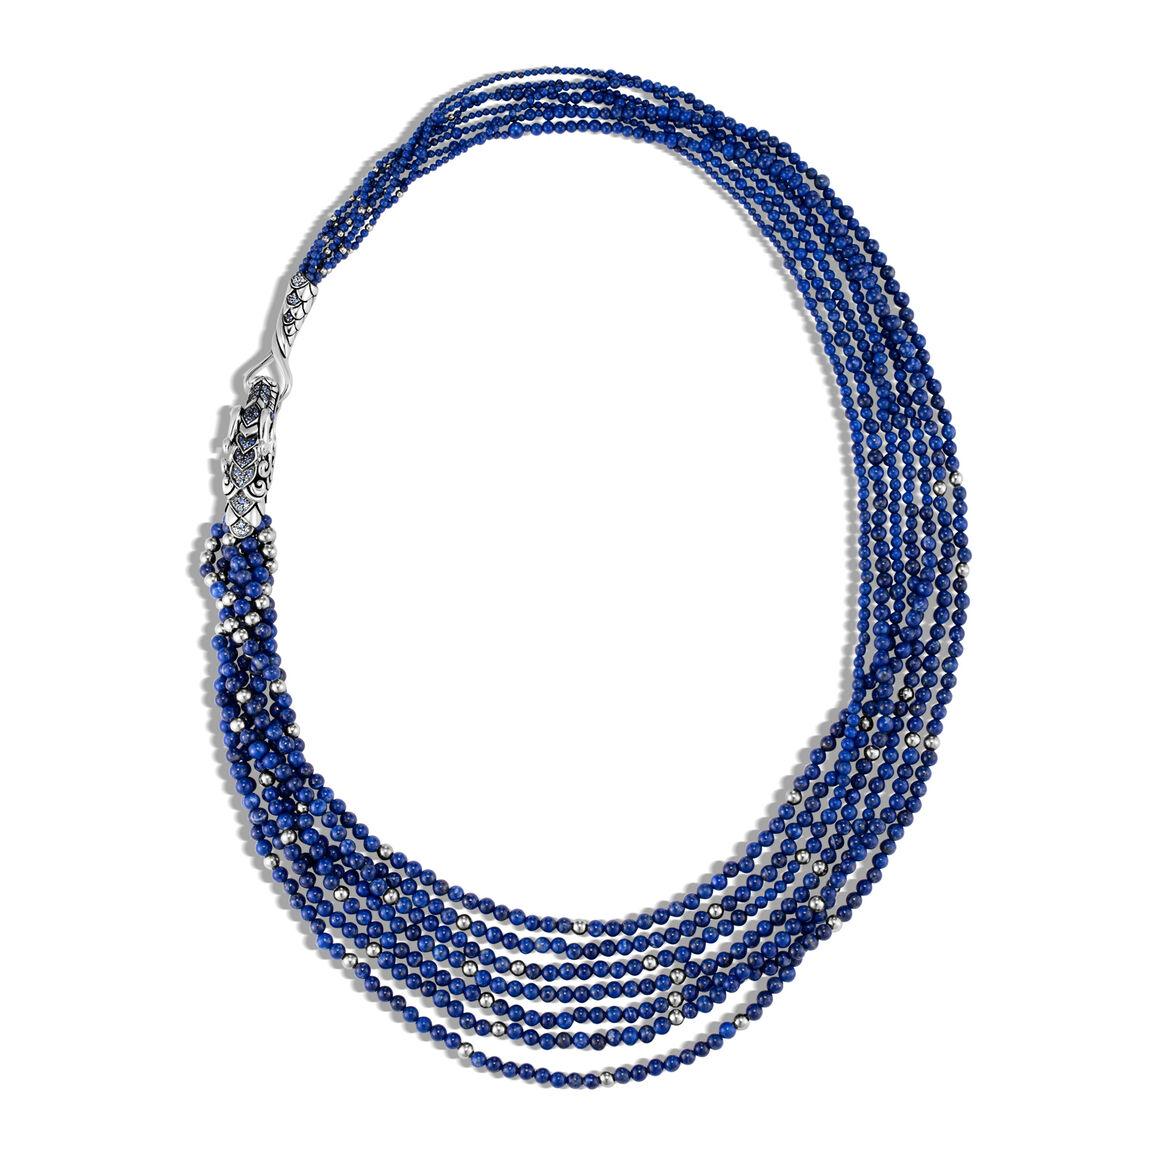 Legends Naga Bib Necklace in Silver, Gemstone